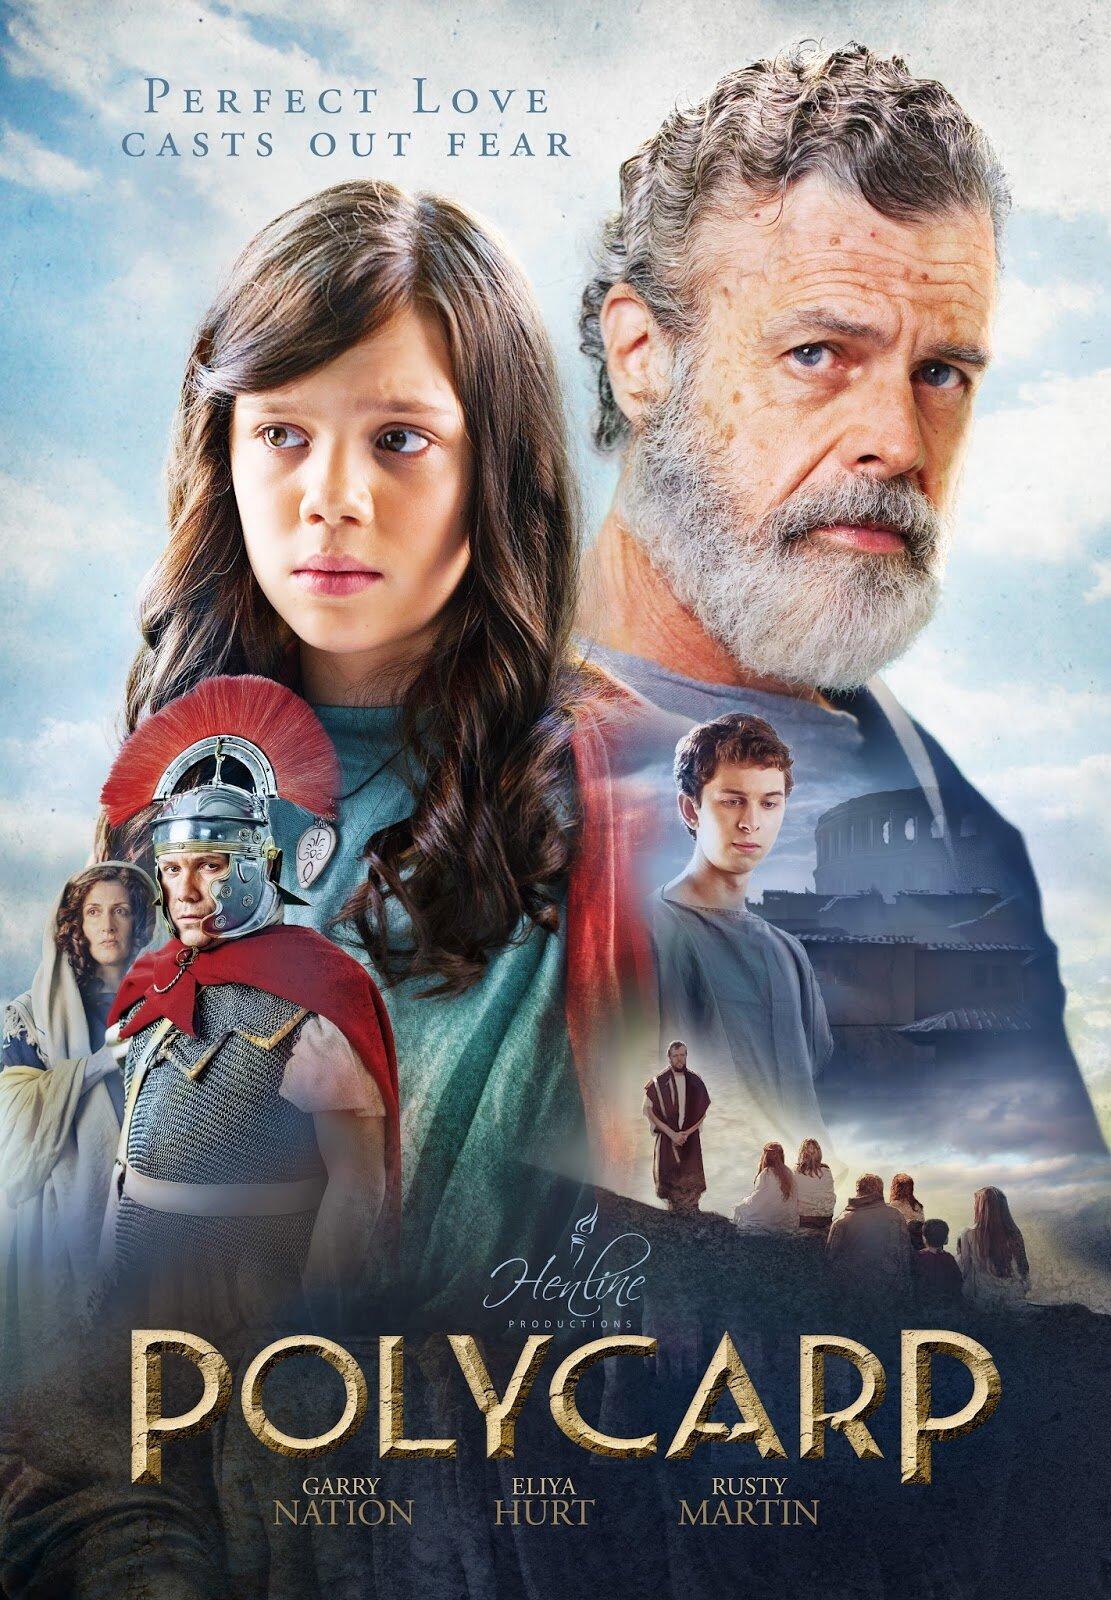 Polycarp movie poster from Nashvillewife.com